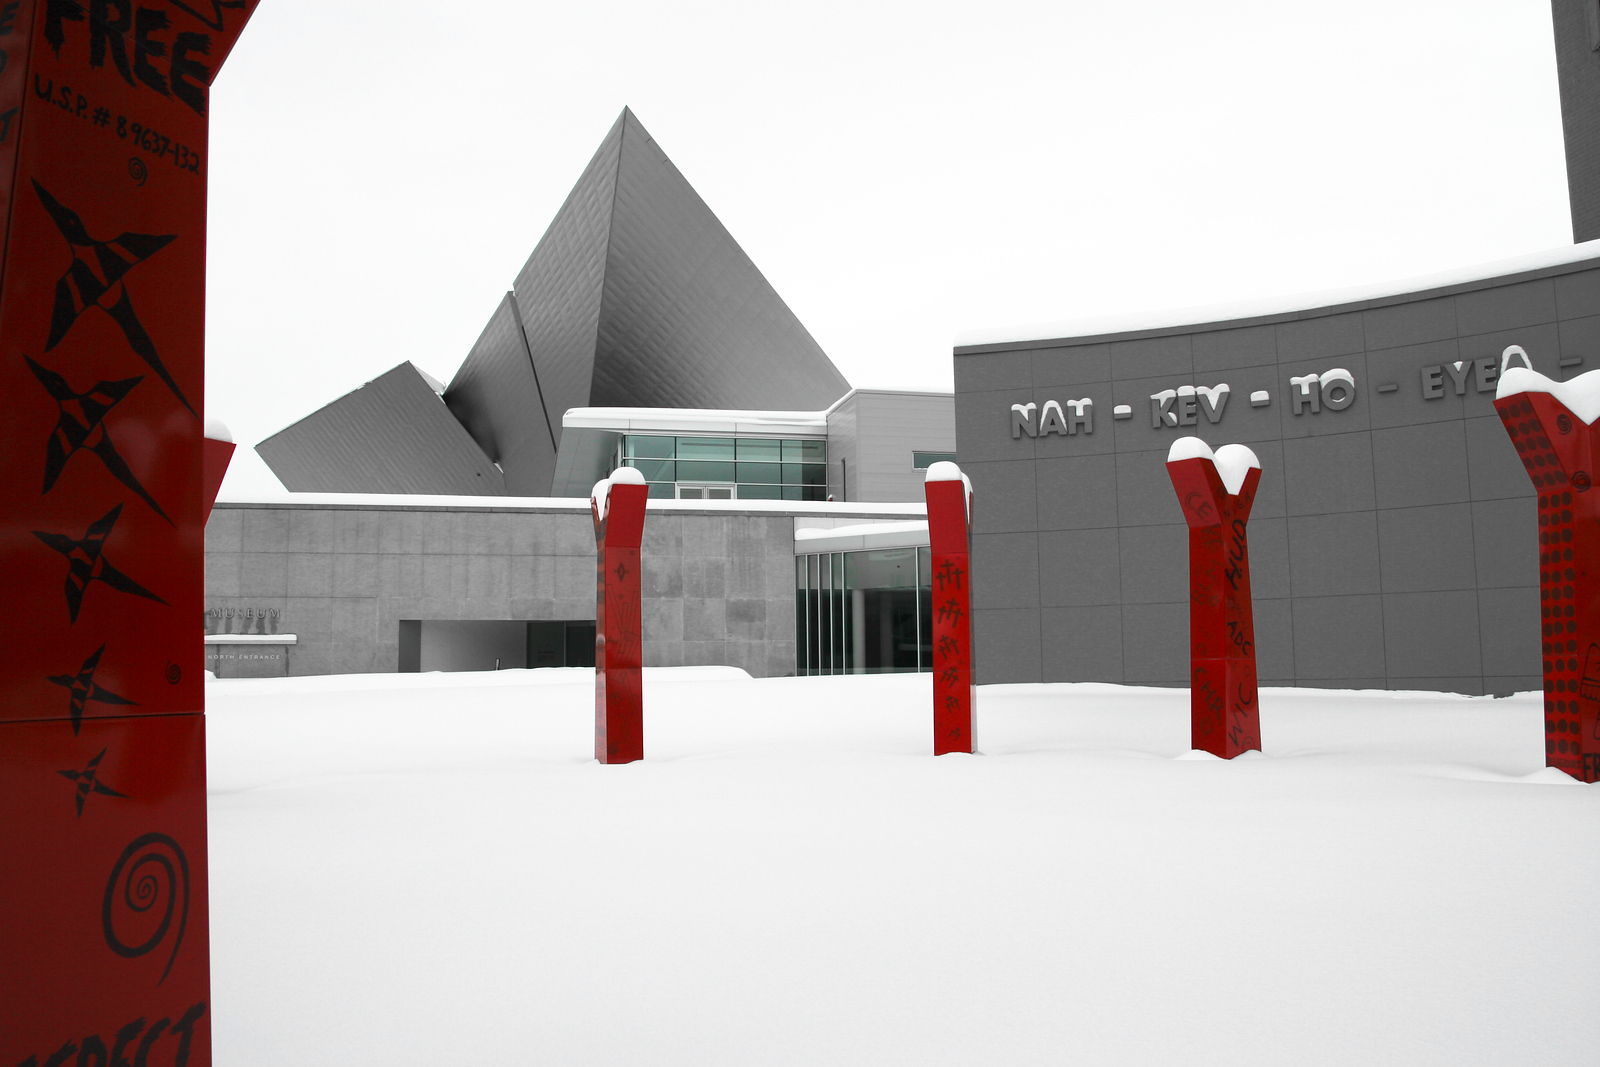 DAM In The Snow